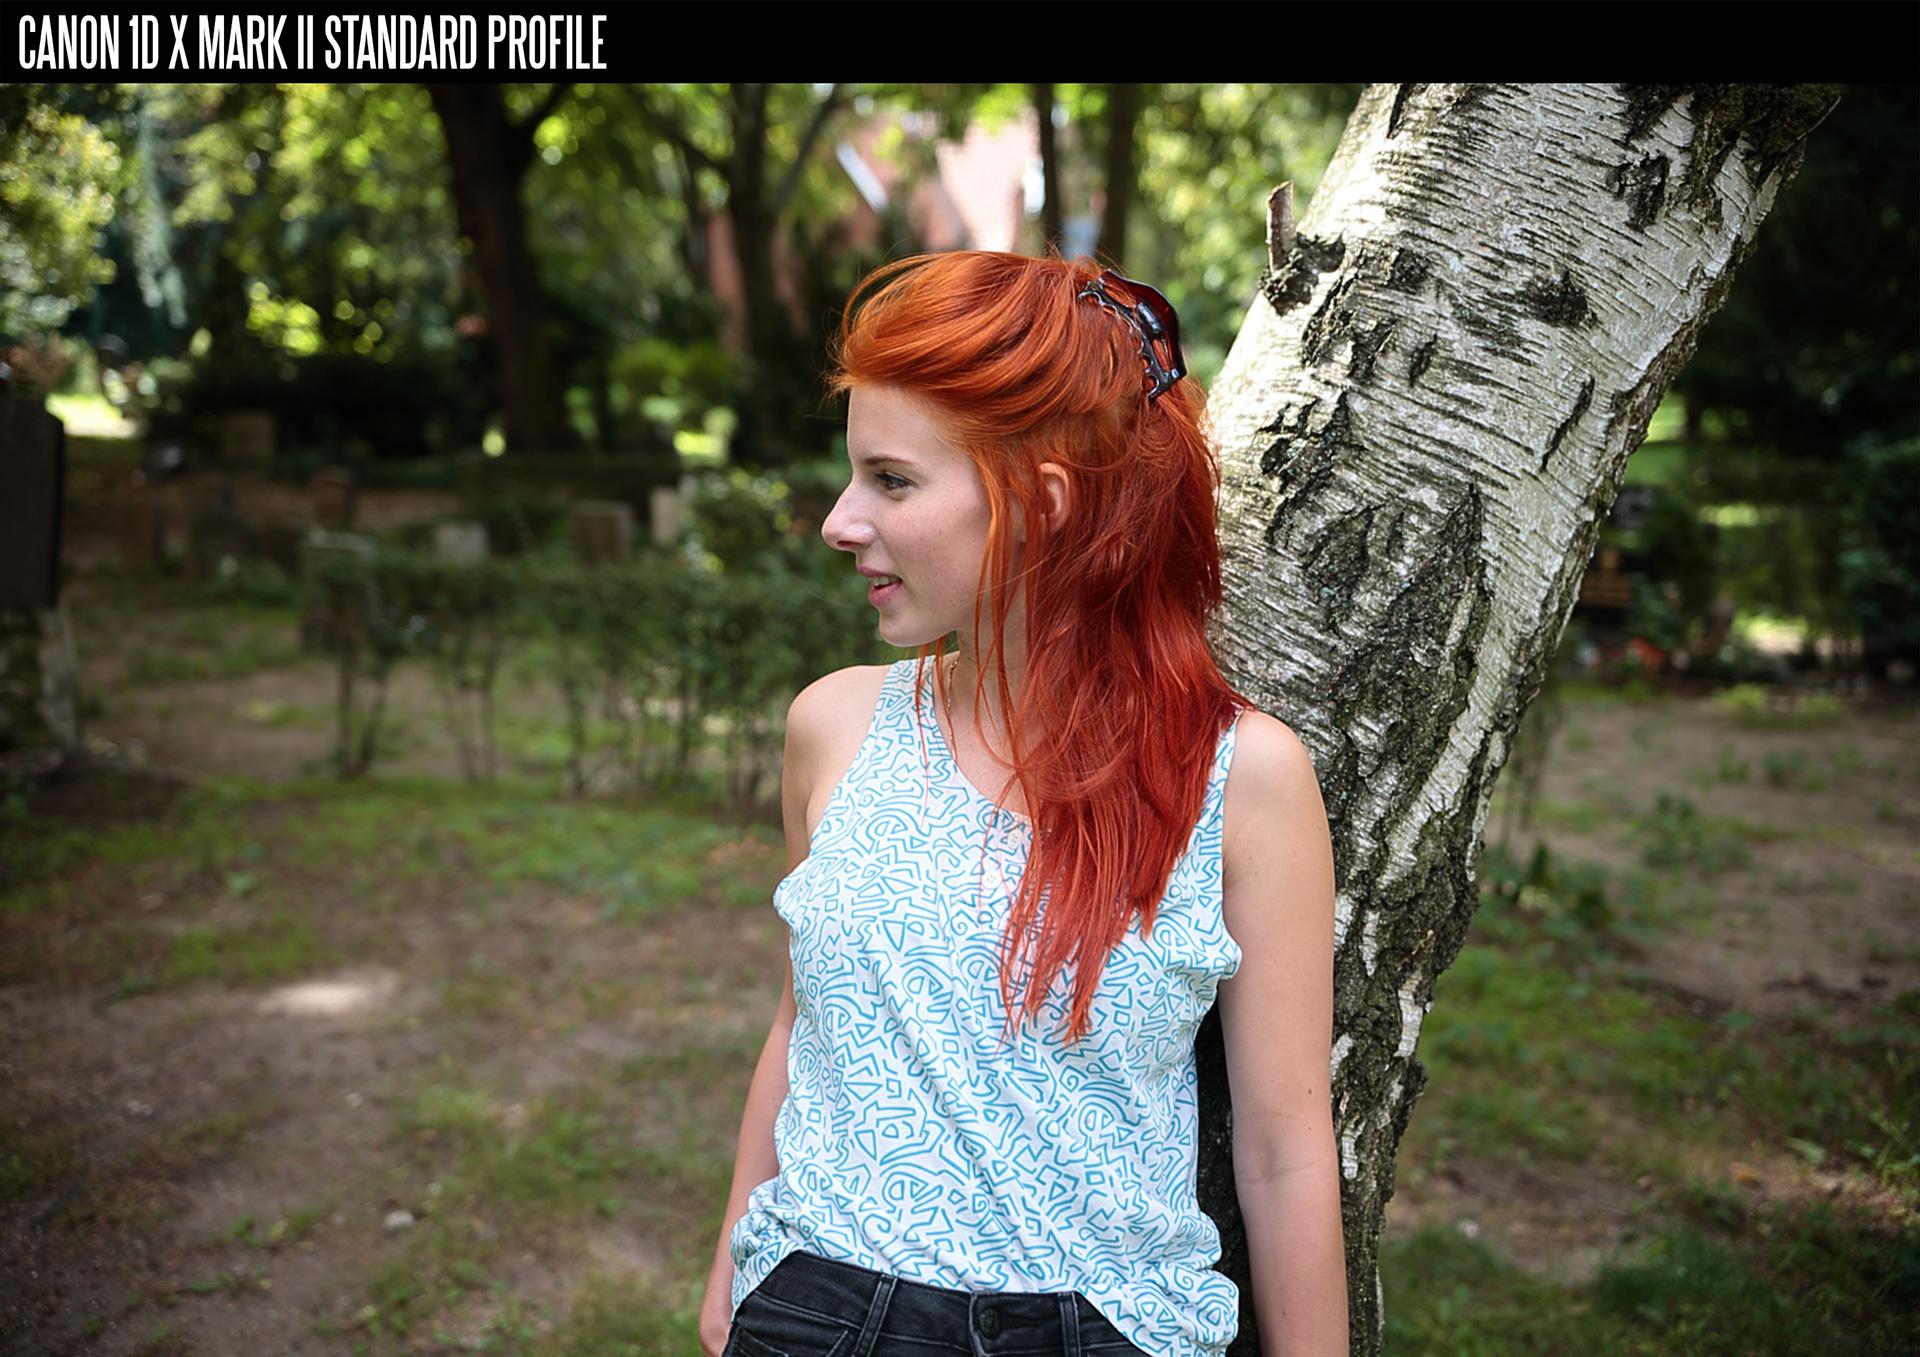 Download Picture Style Untuk Canon 600d - matessoft-asoft